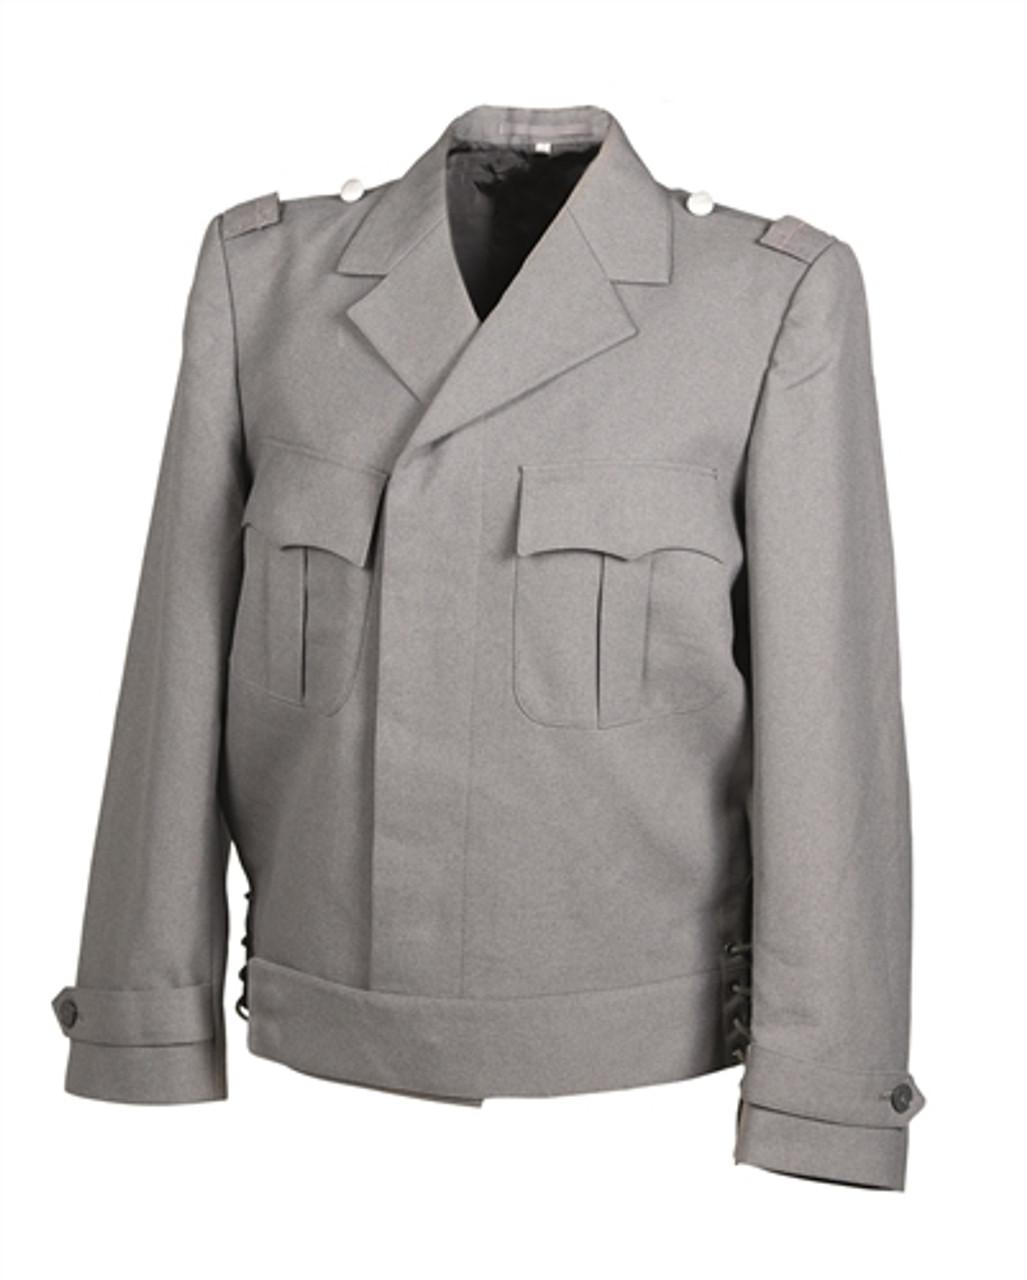 BW Grey Mountain Troops Tunic from Hessen Surplus